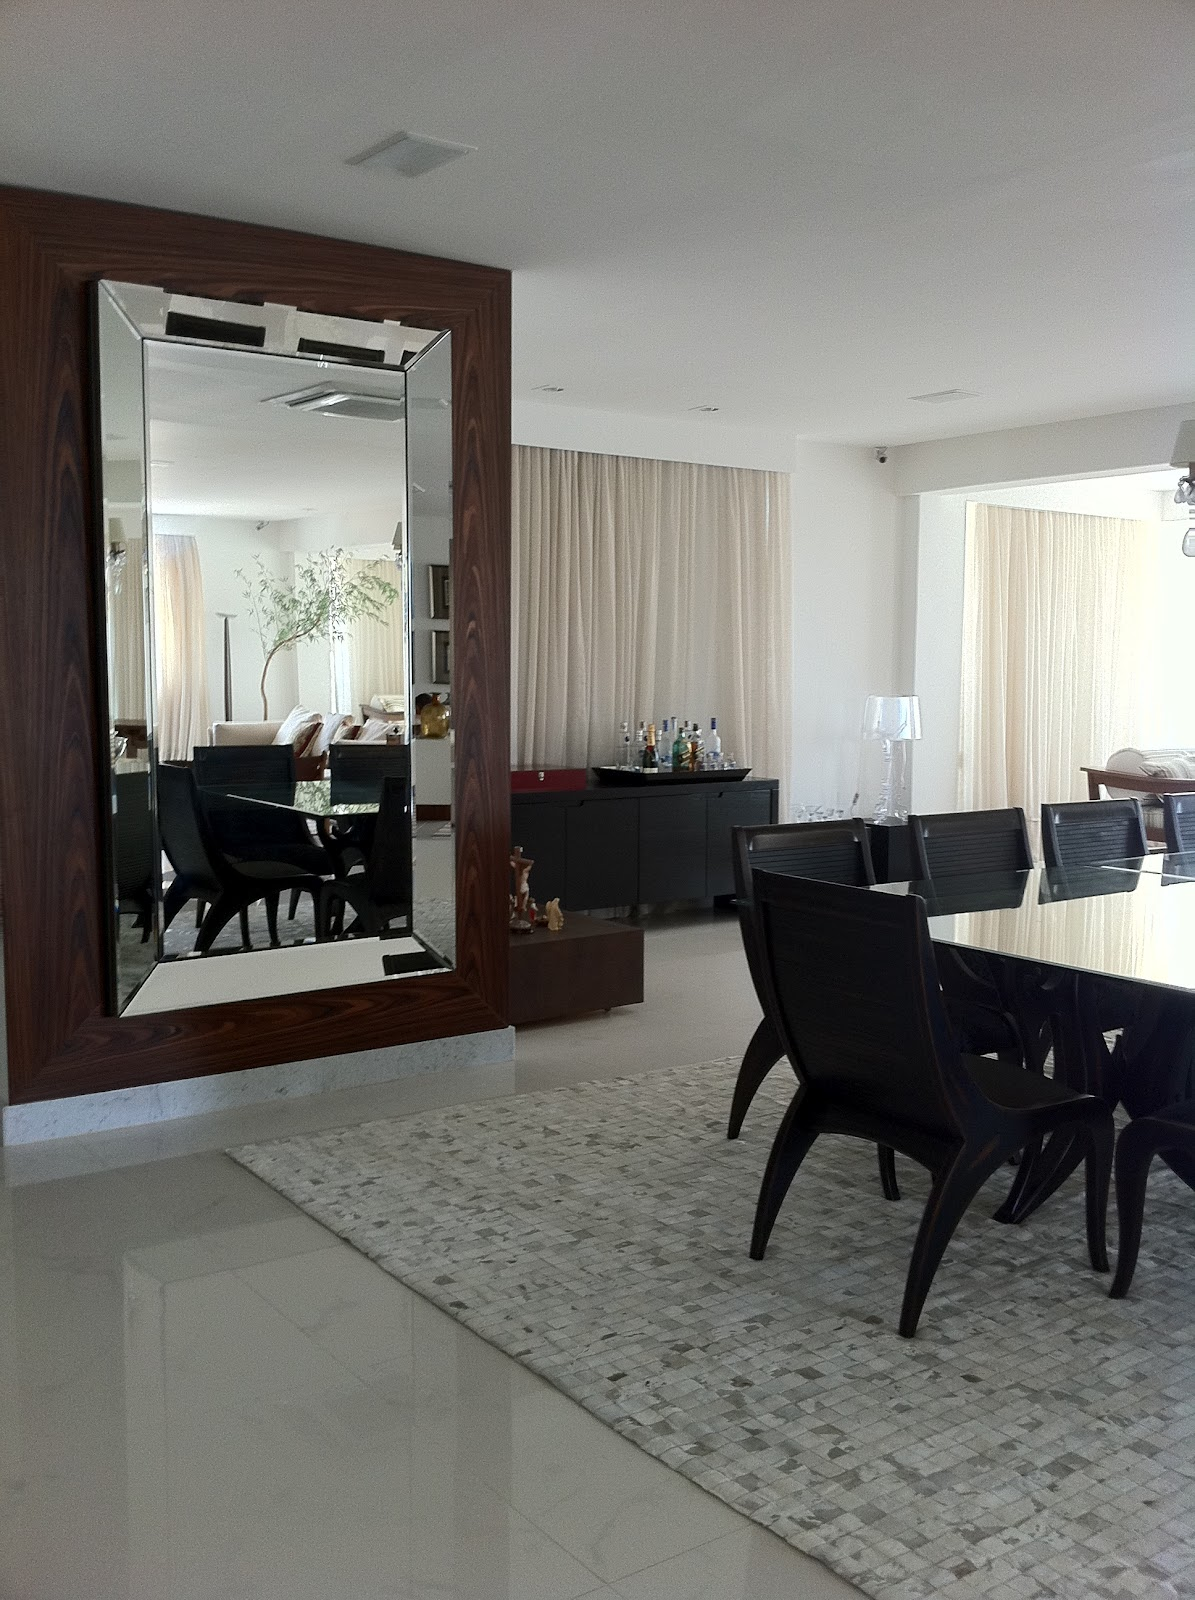 Oglinda mare pentru livingroom decorat in stil neo-clasic